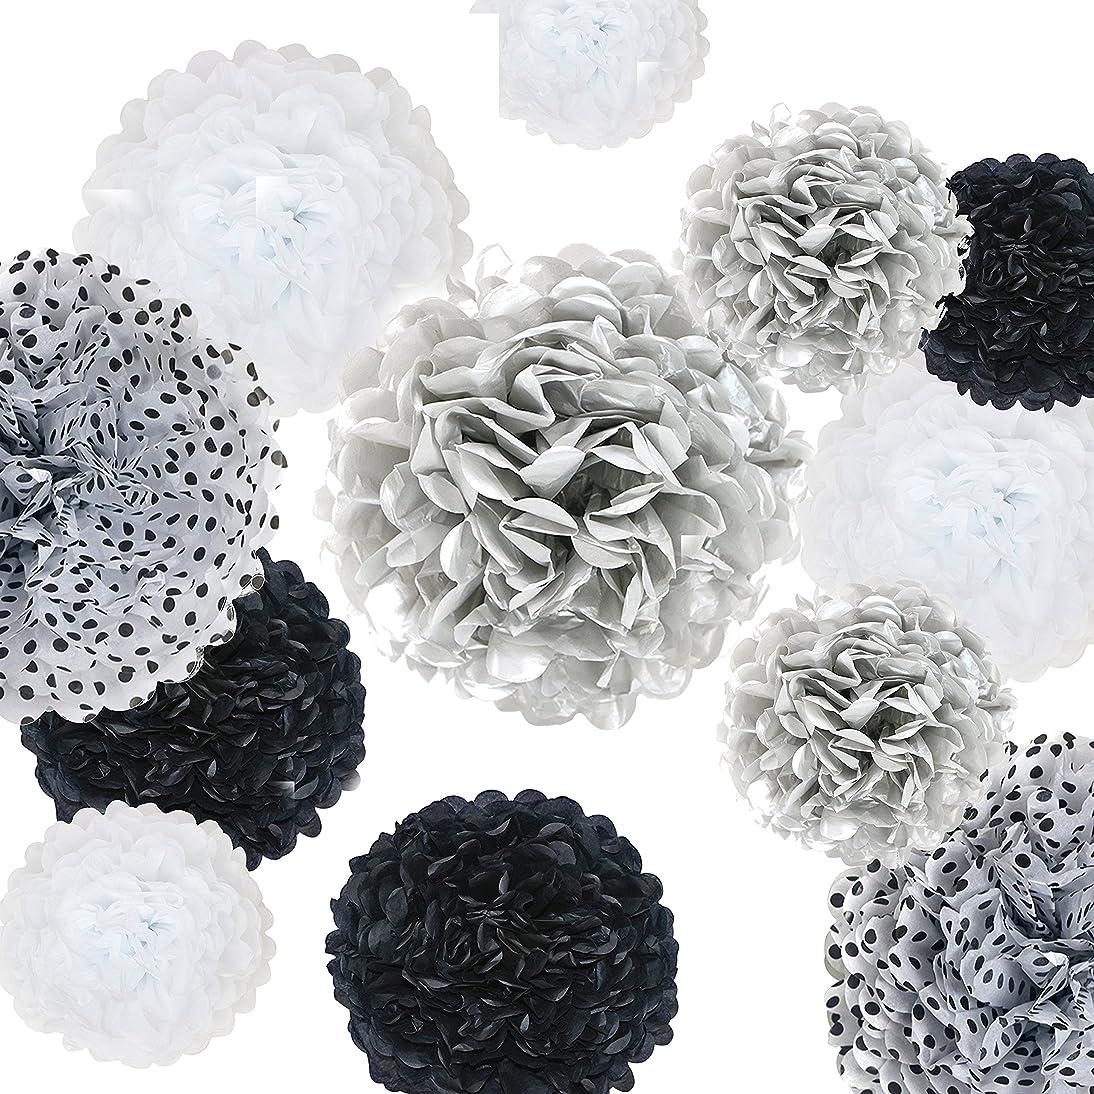 VIDAL CRAFTS 20 Pcs Tissue Paper Pom Poms Kit (14